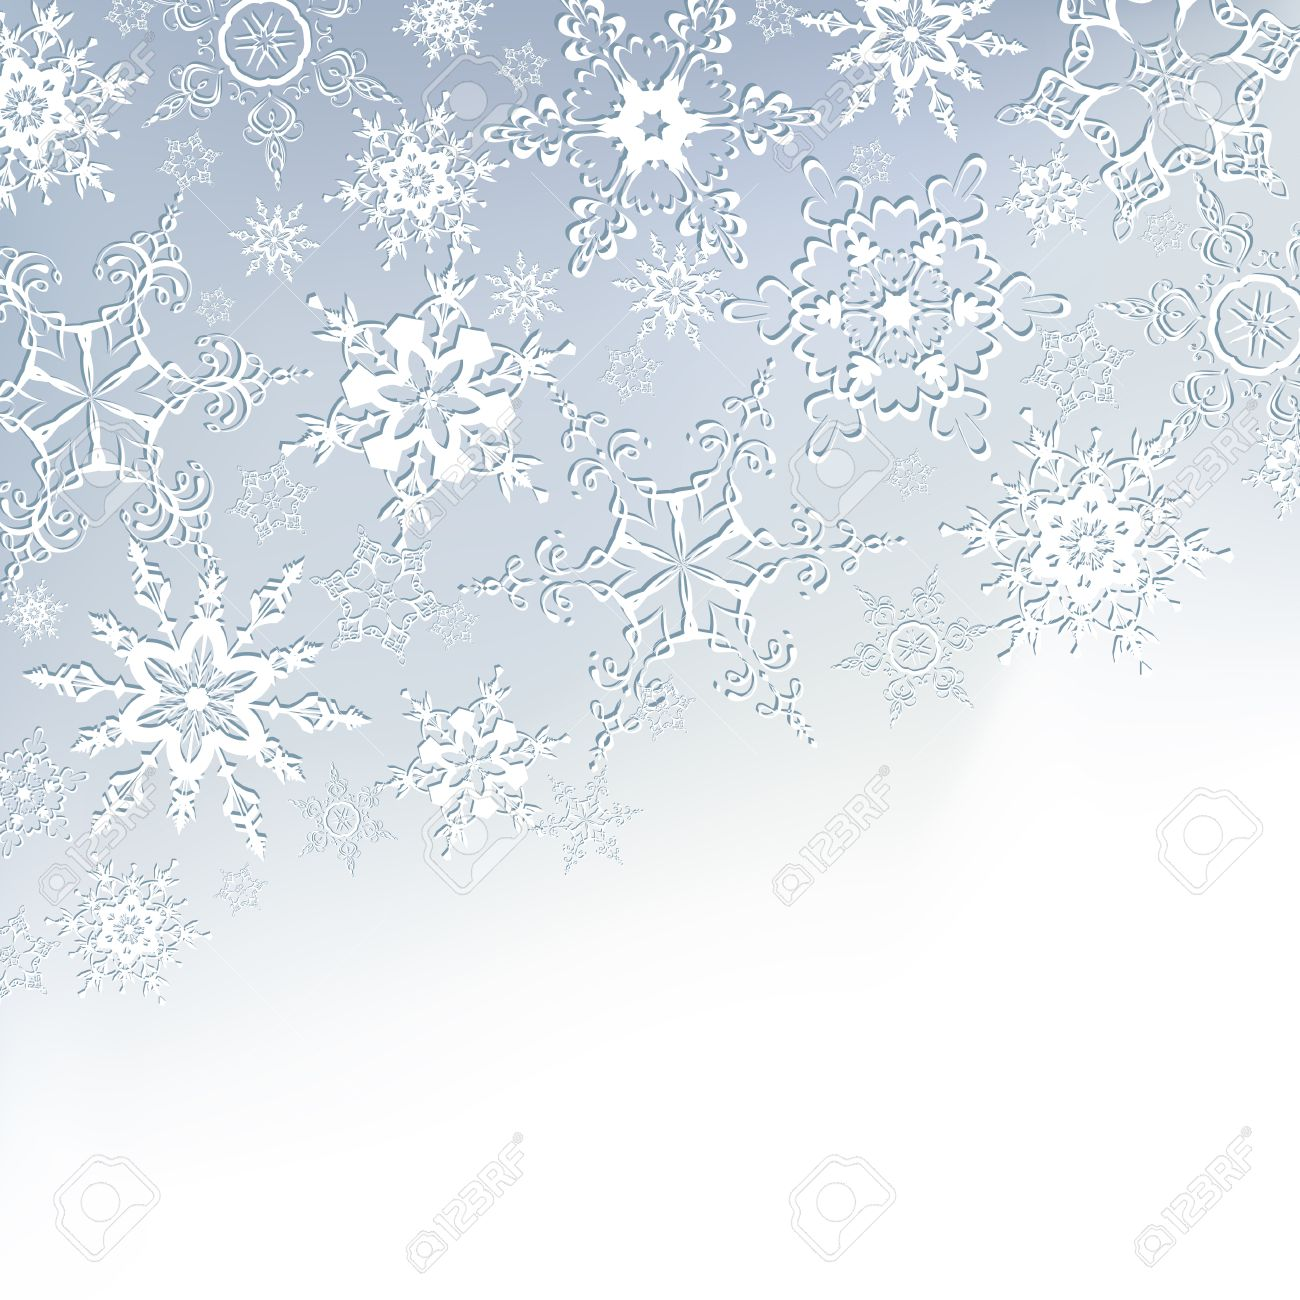 White Christmas Snowflake Backgrounds